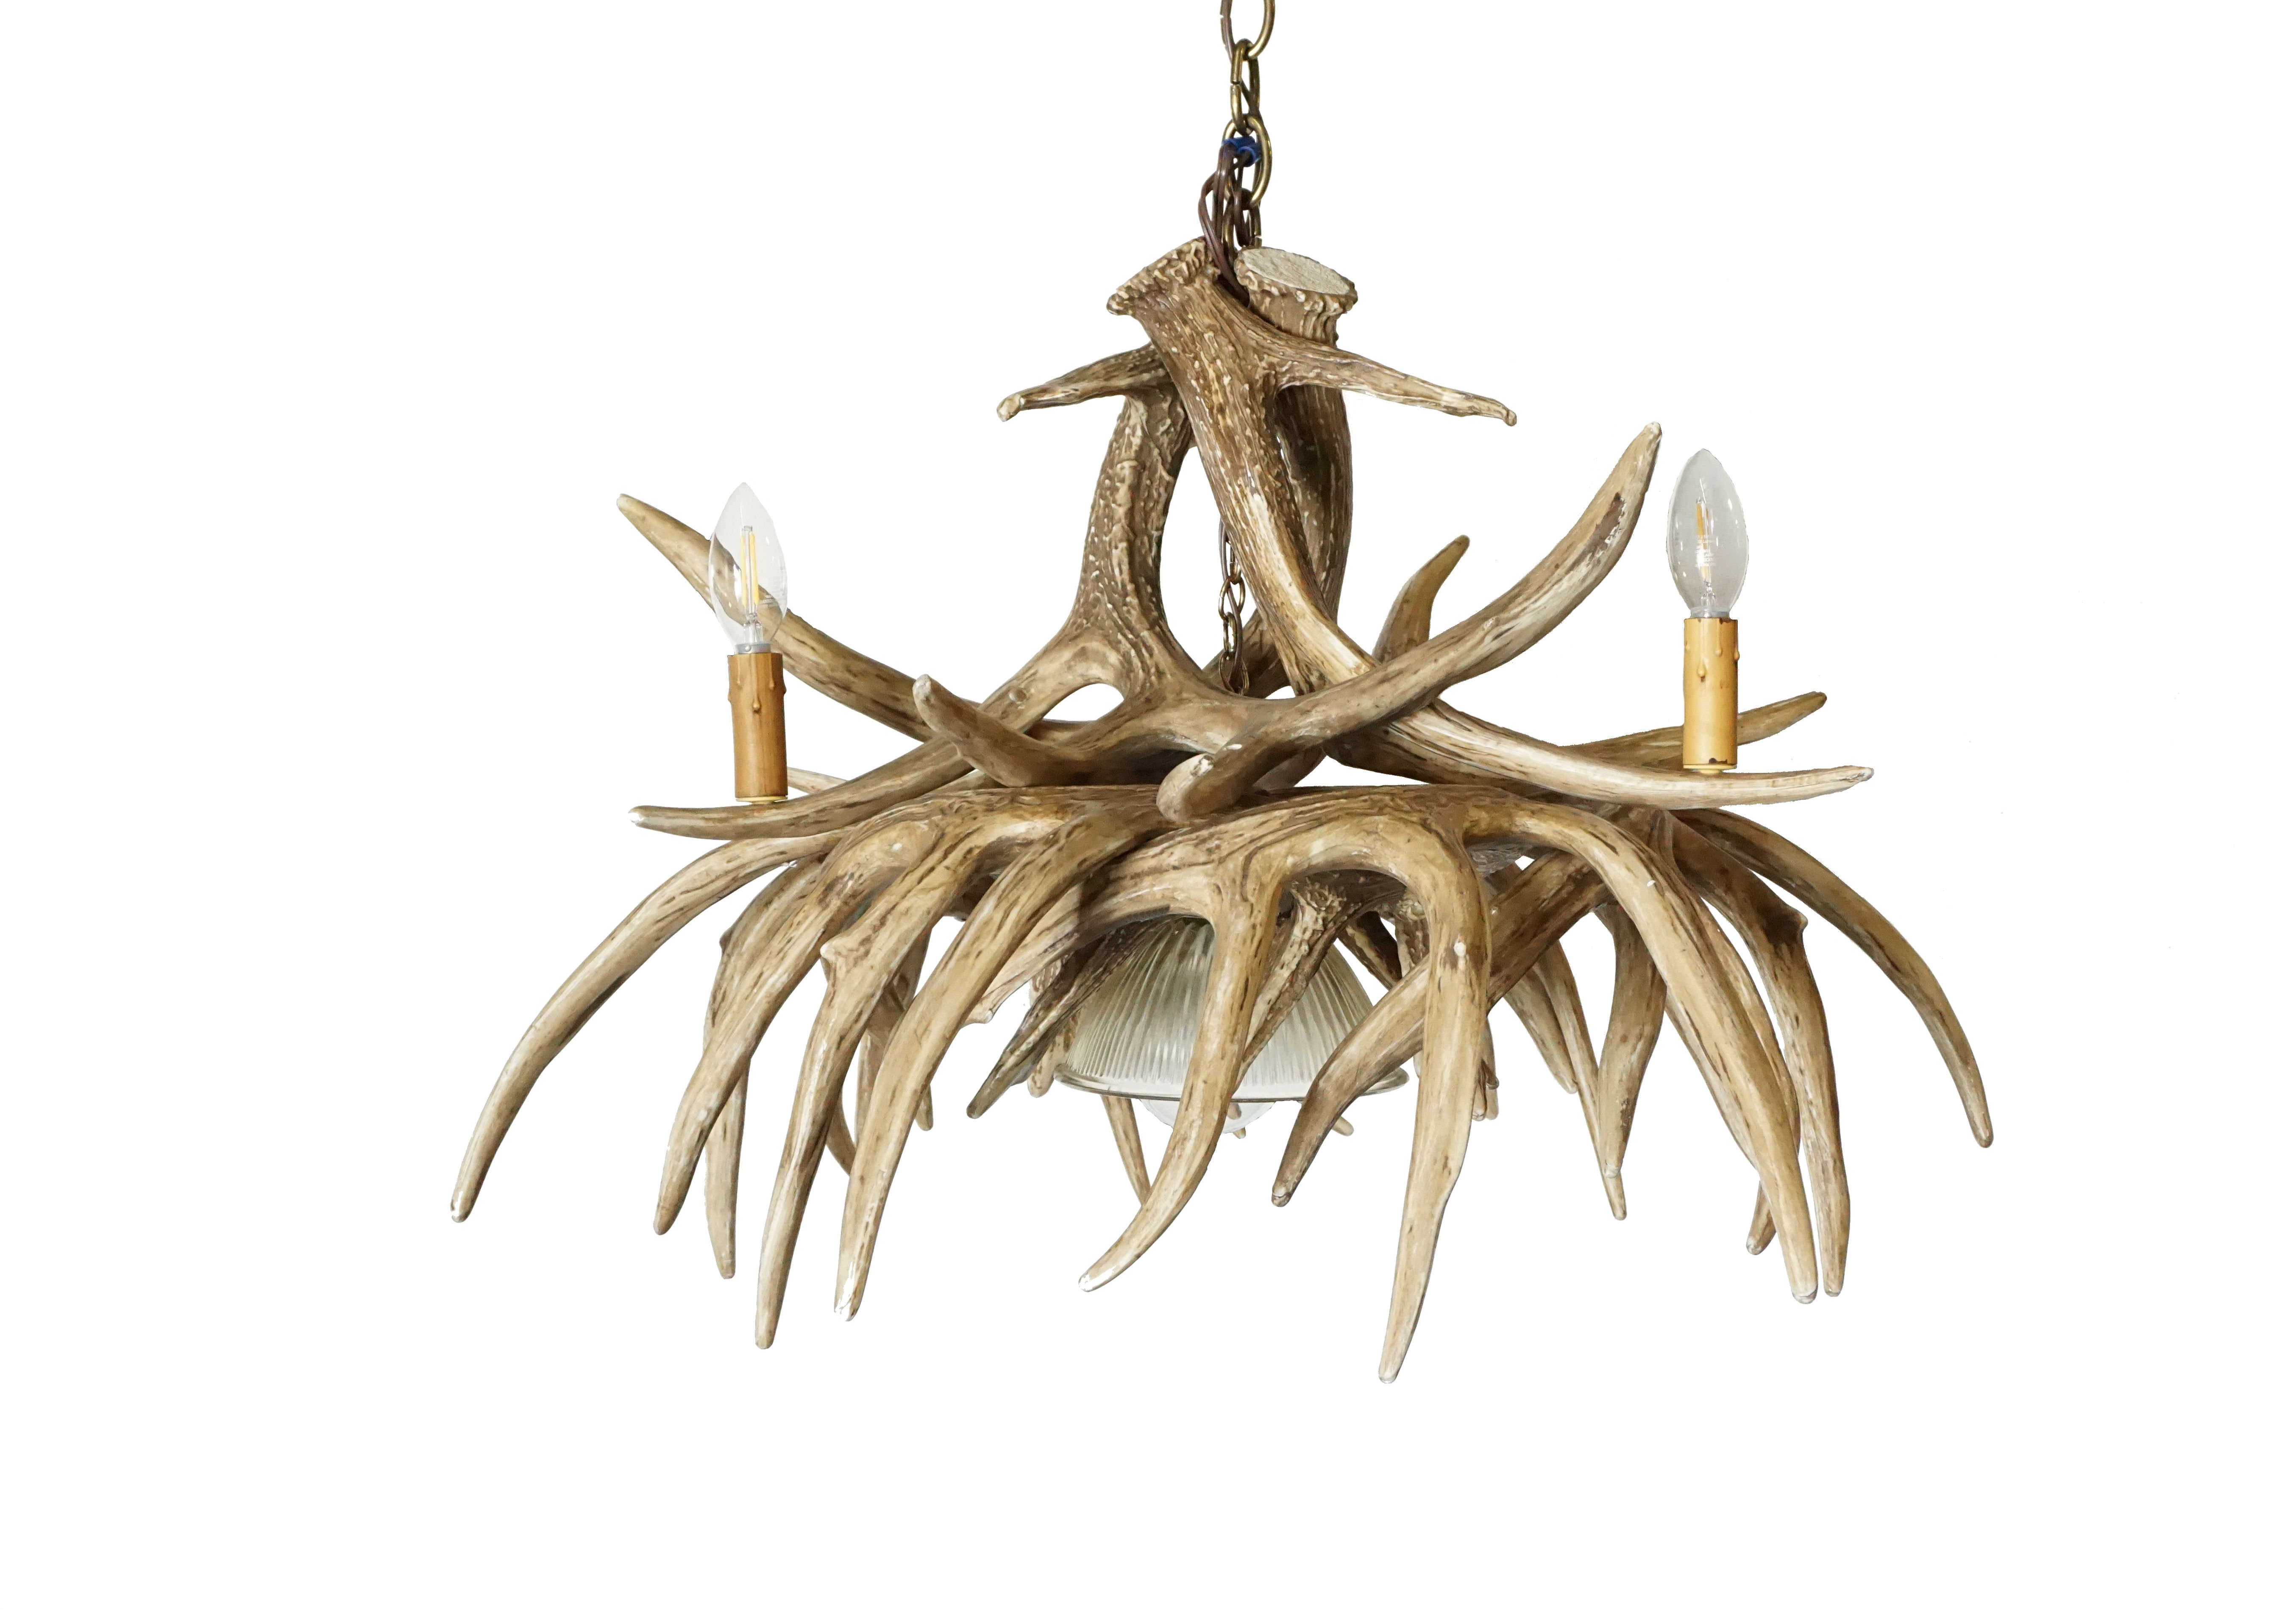 Whitetail deer 9 large antler chandelier cast horn designs whitetail deer 9 large antler chandelier arubaitofo Images